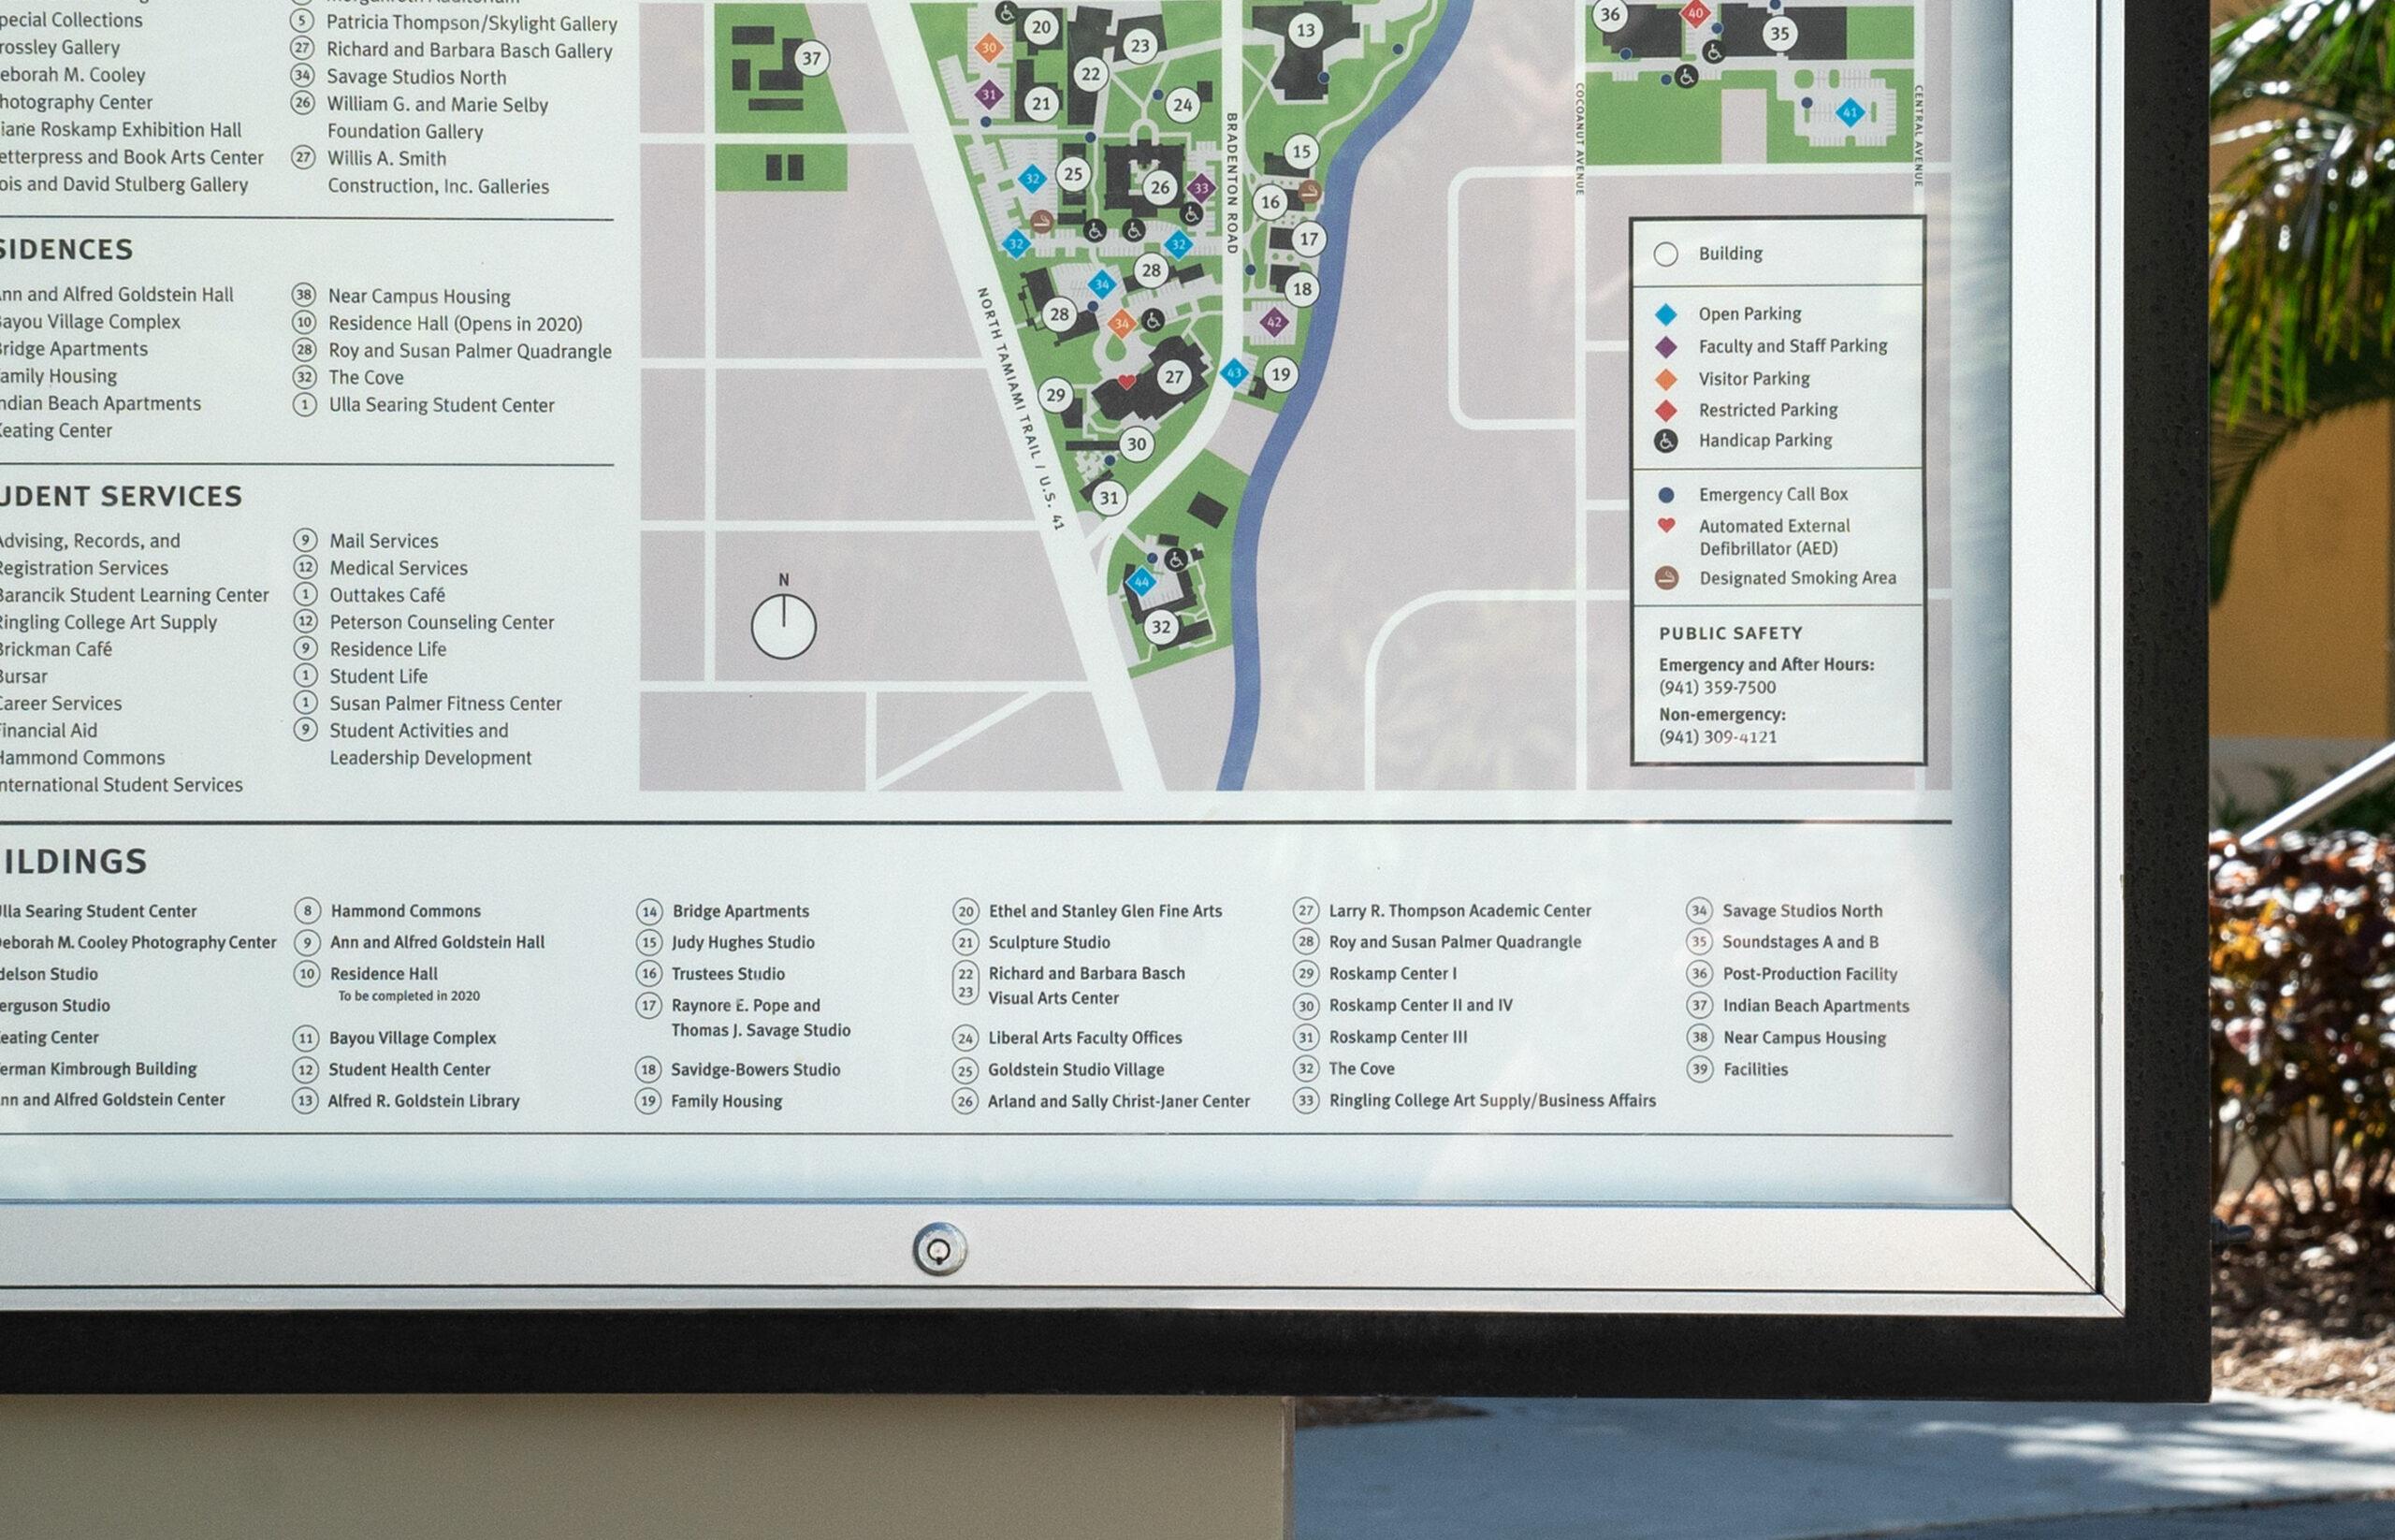 RCAD_Map_Kiosk_Detail